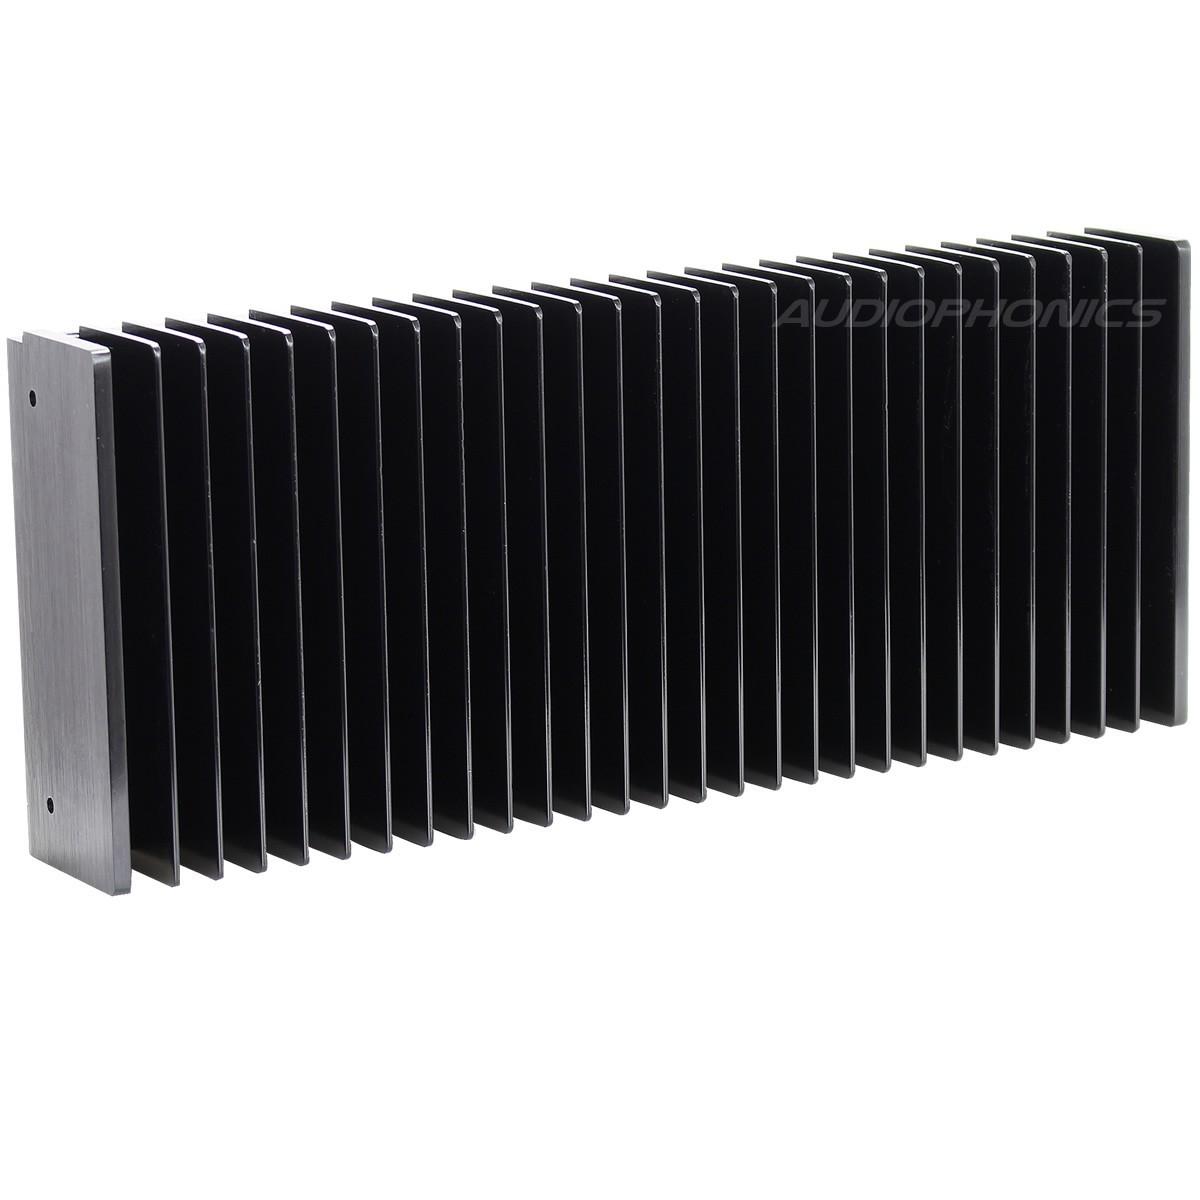 Heat Sink Radiator Black Anodized 300x125x50mm Black